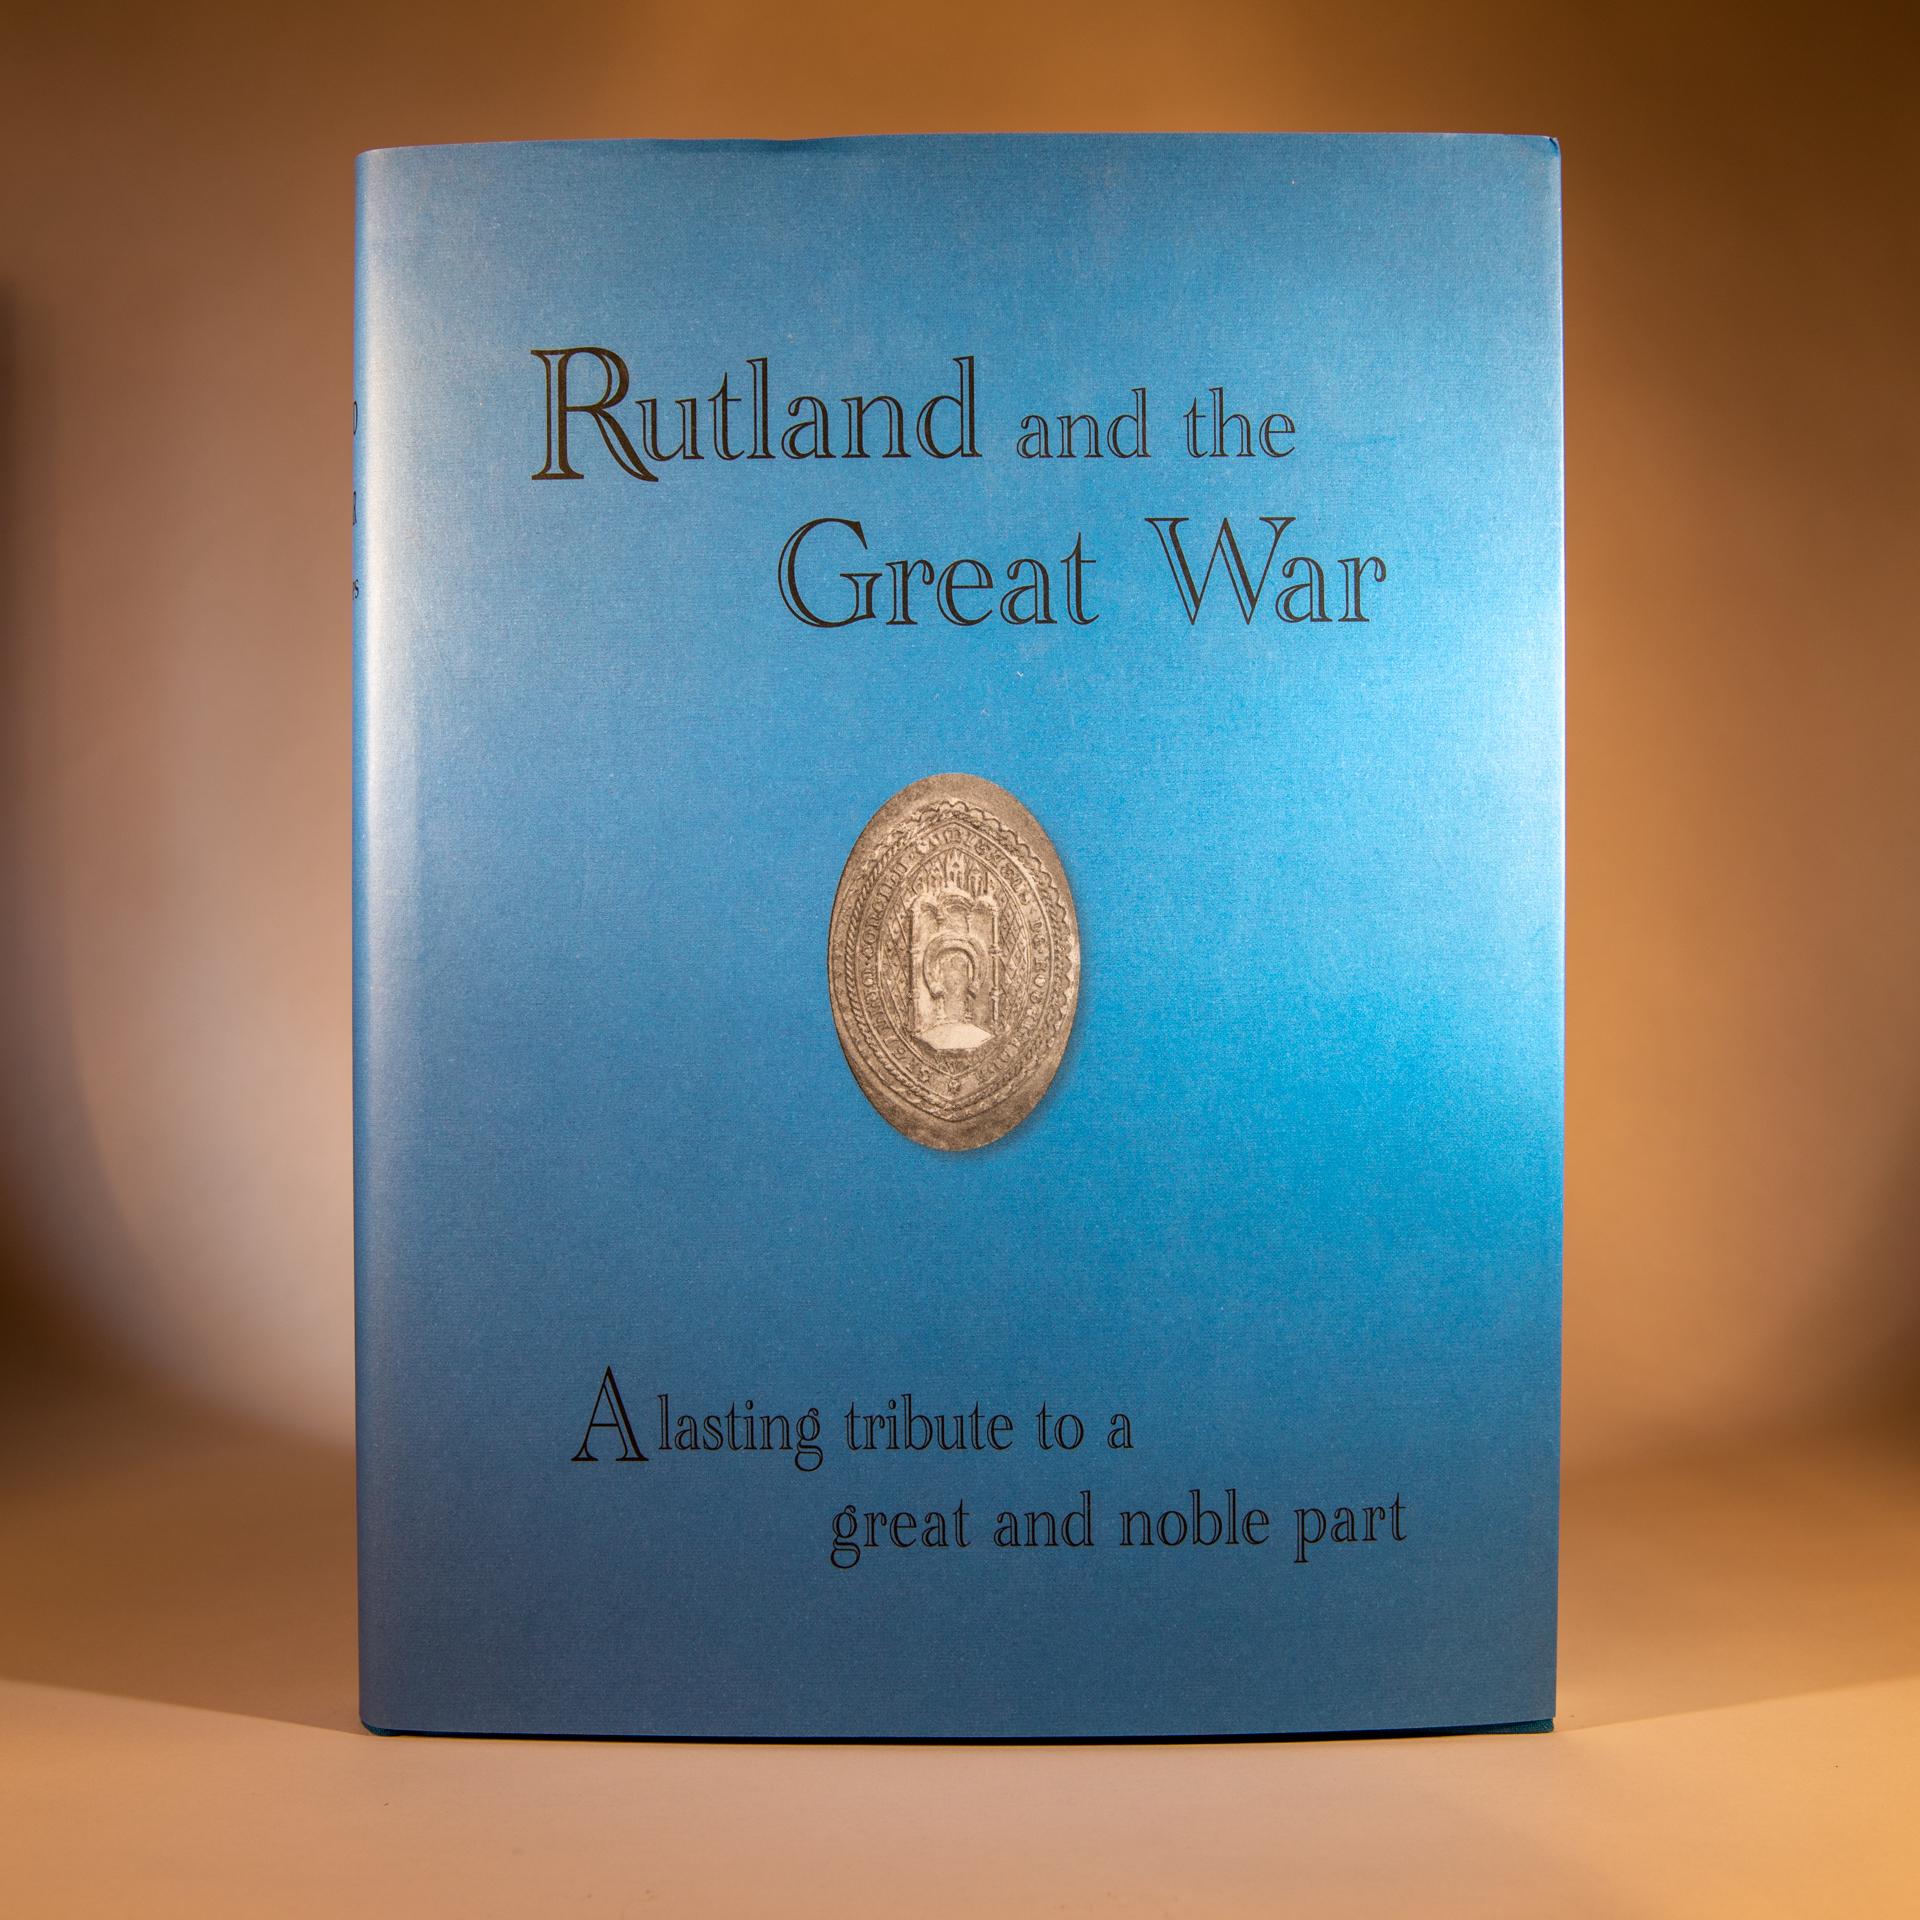 Rutland and the Great War